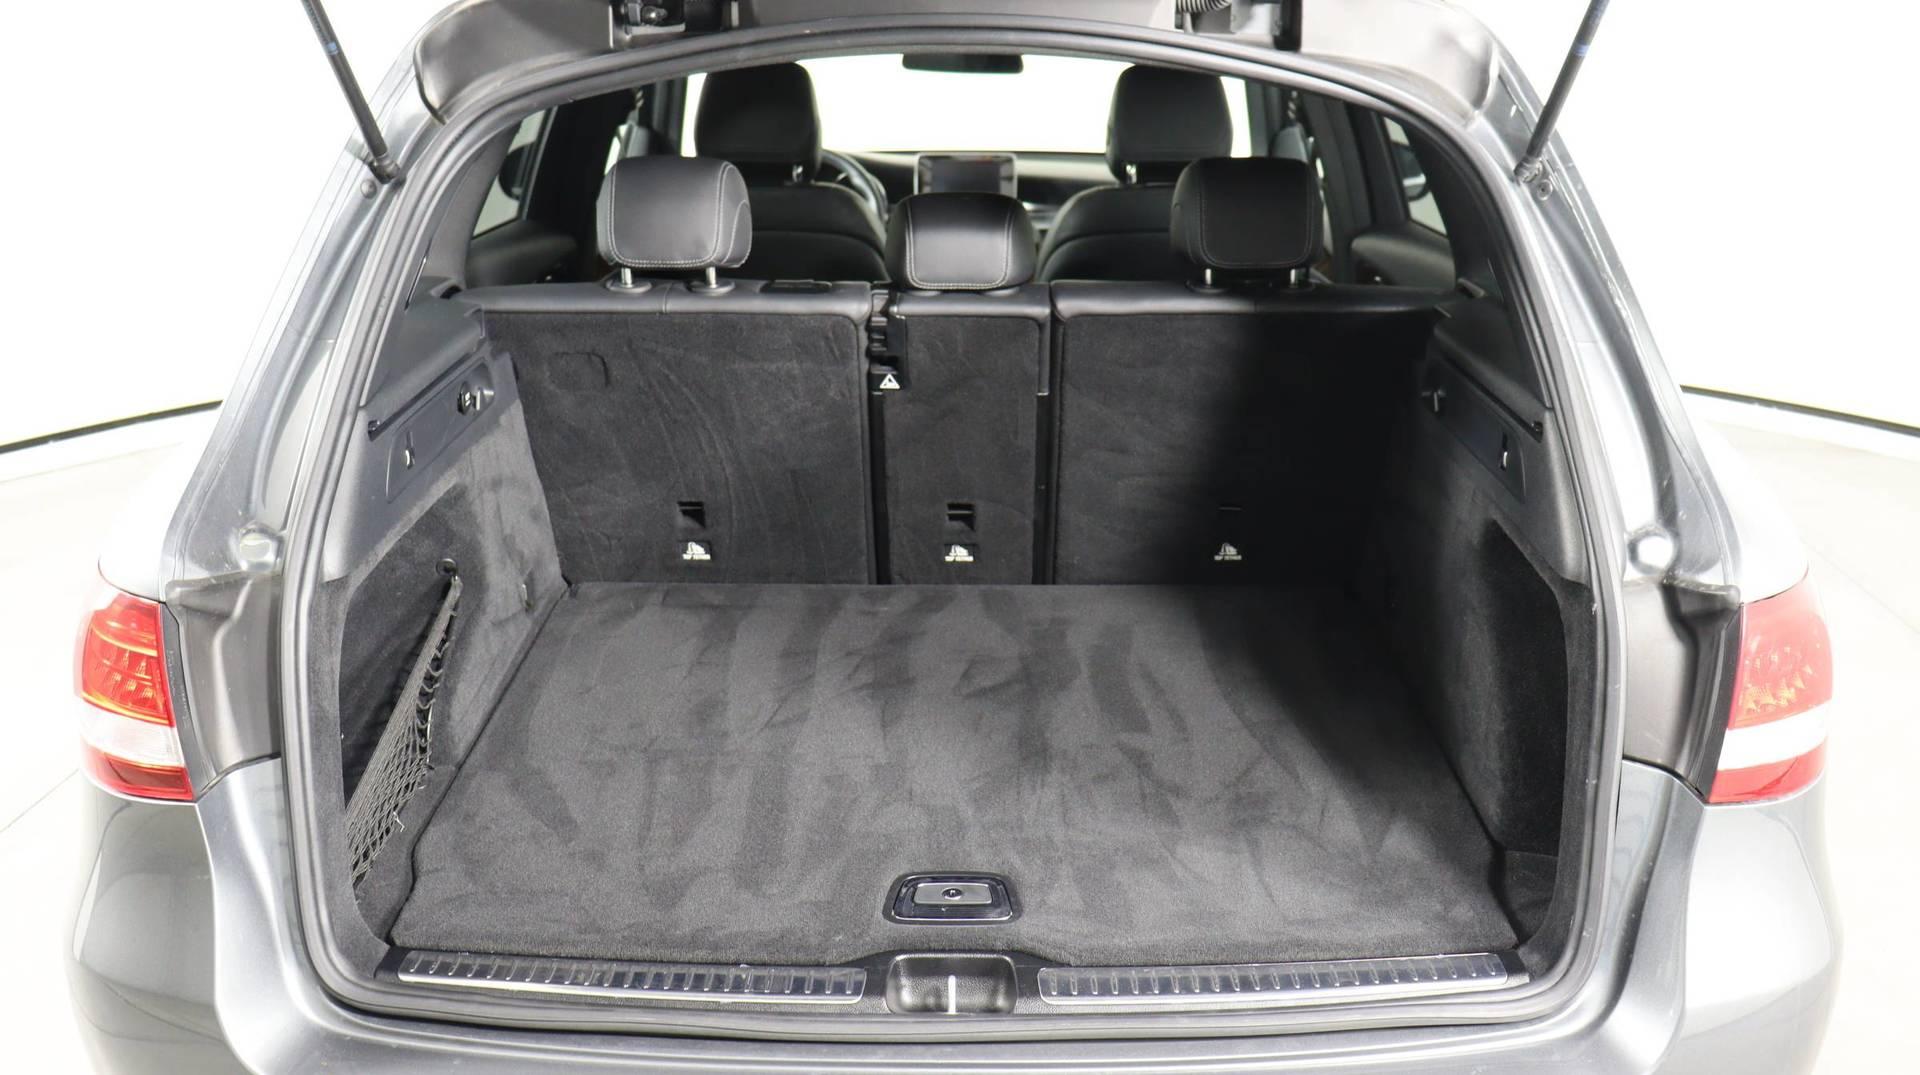 used vehicle - SUV MERCEDES-BENZ GLC 2017